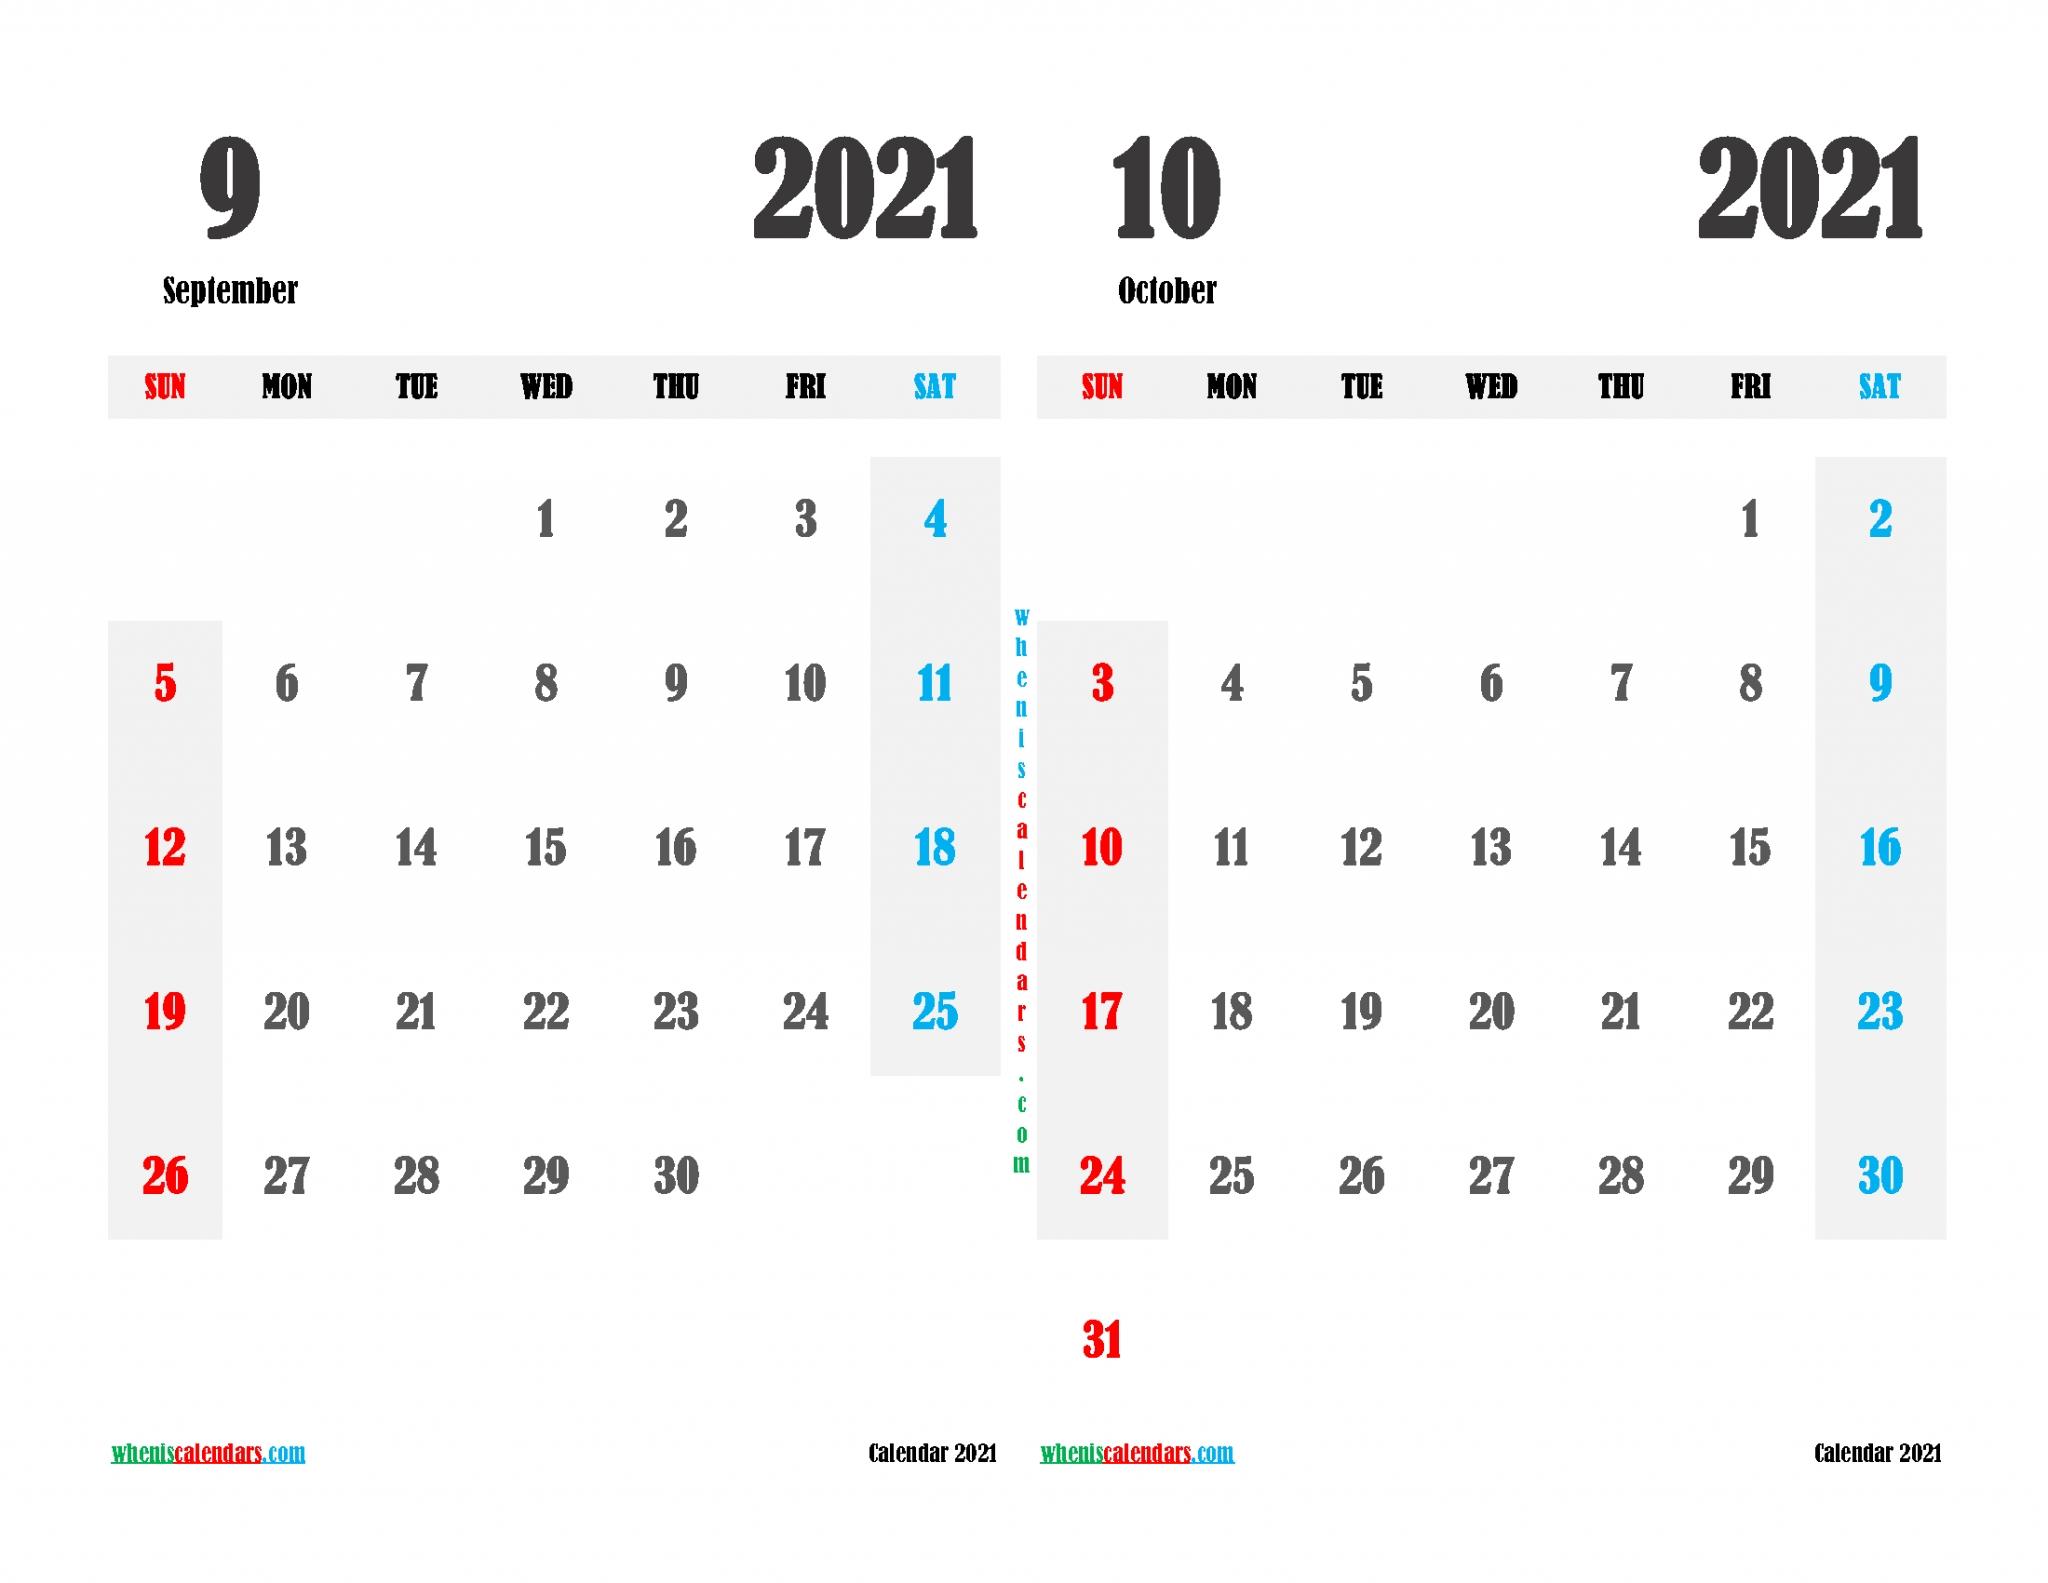 Sep And Oct 2021 Calendar Printable September And October 2021 Calendar